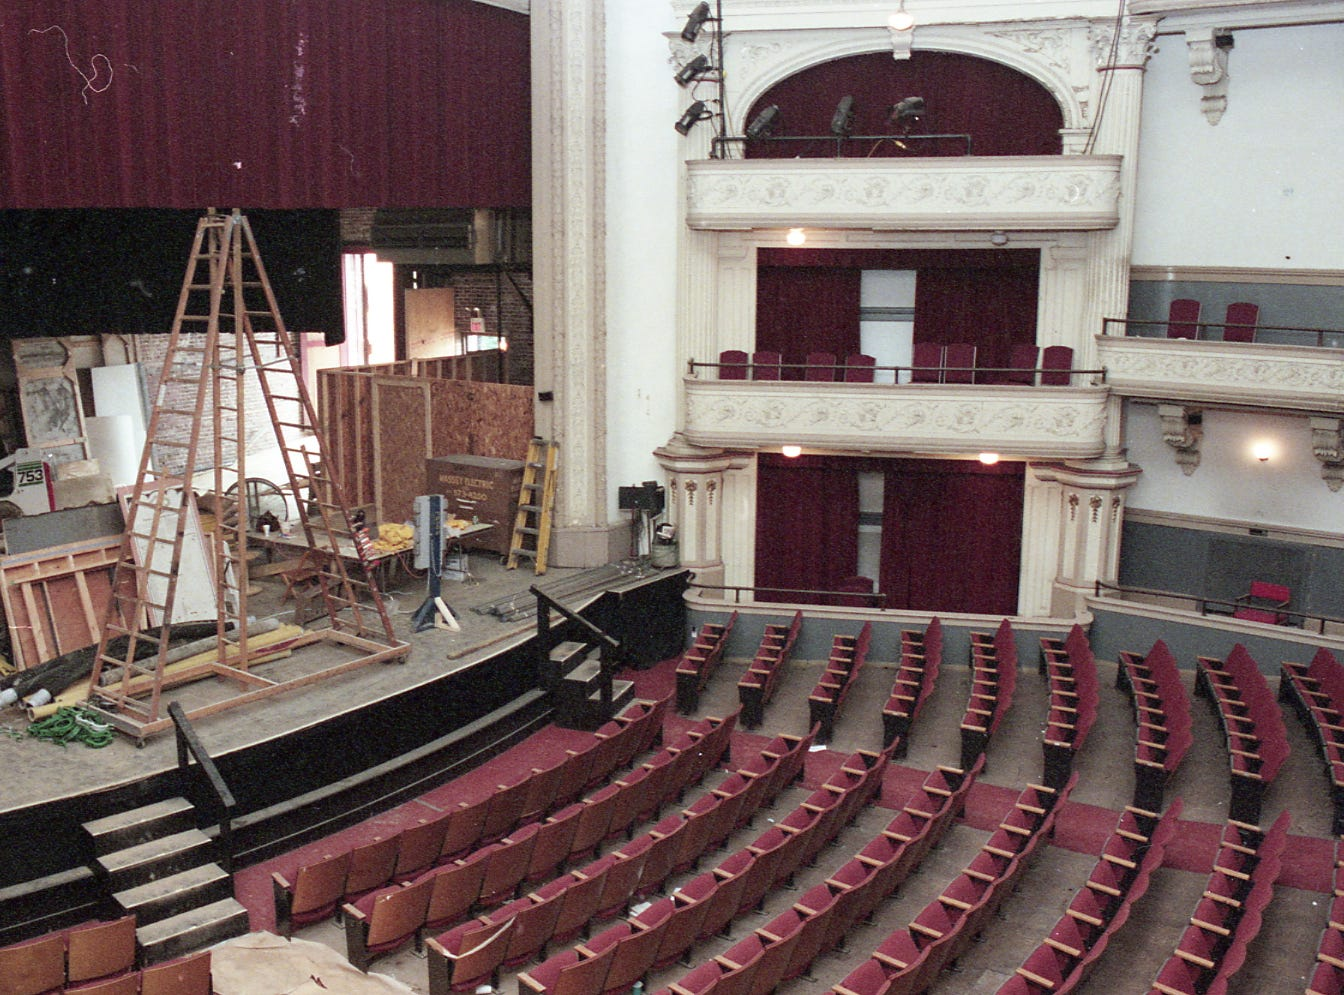 A $1.8 million renovation is underway on the 750-seat Bijou Theatre on August 2, 1998.